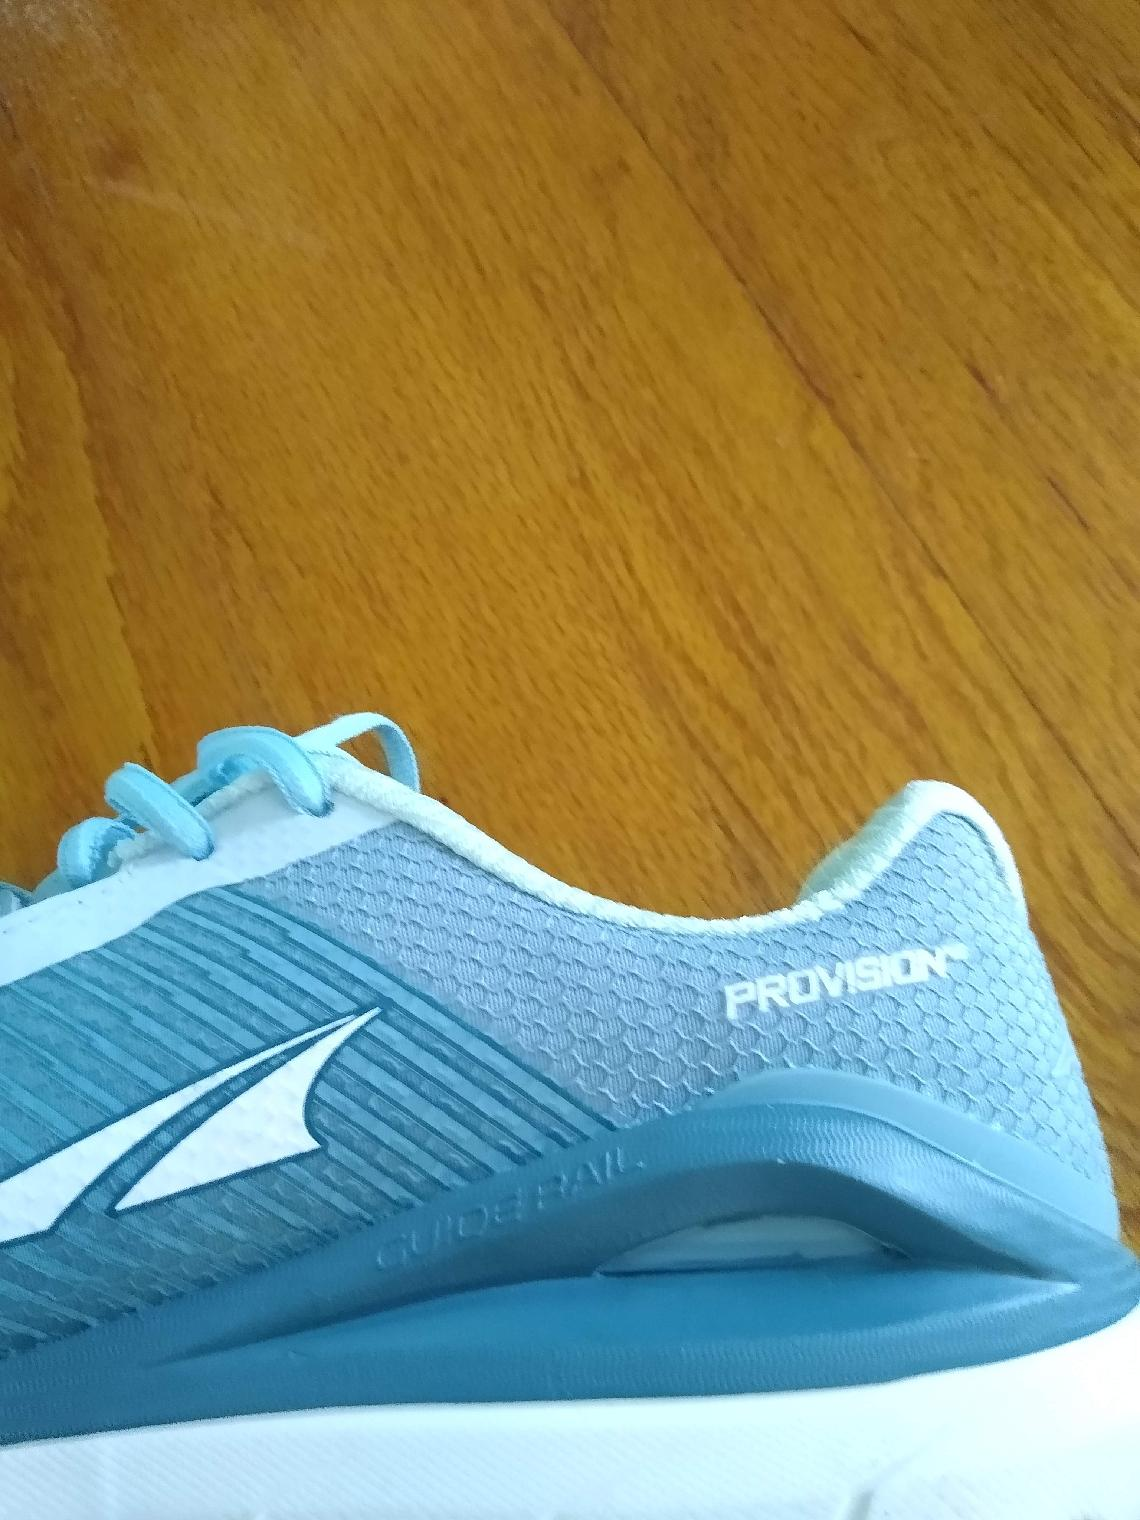 Altra Footwear Provision 4 | Zappos.com